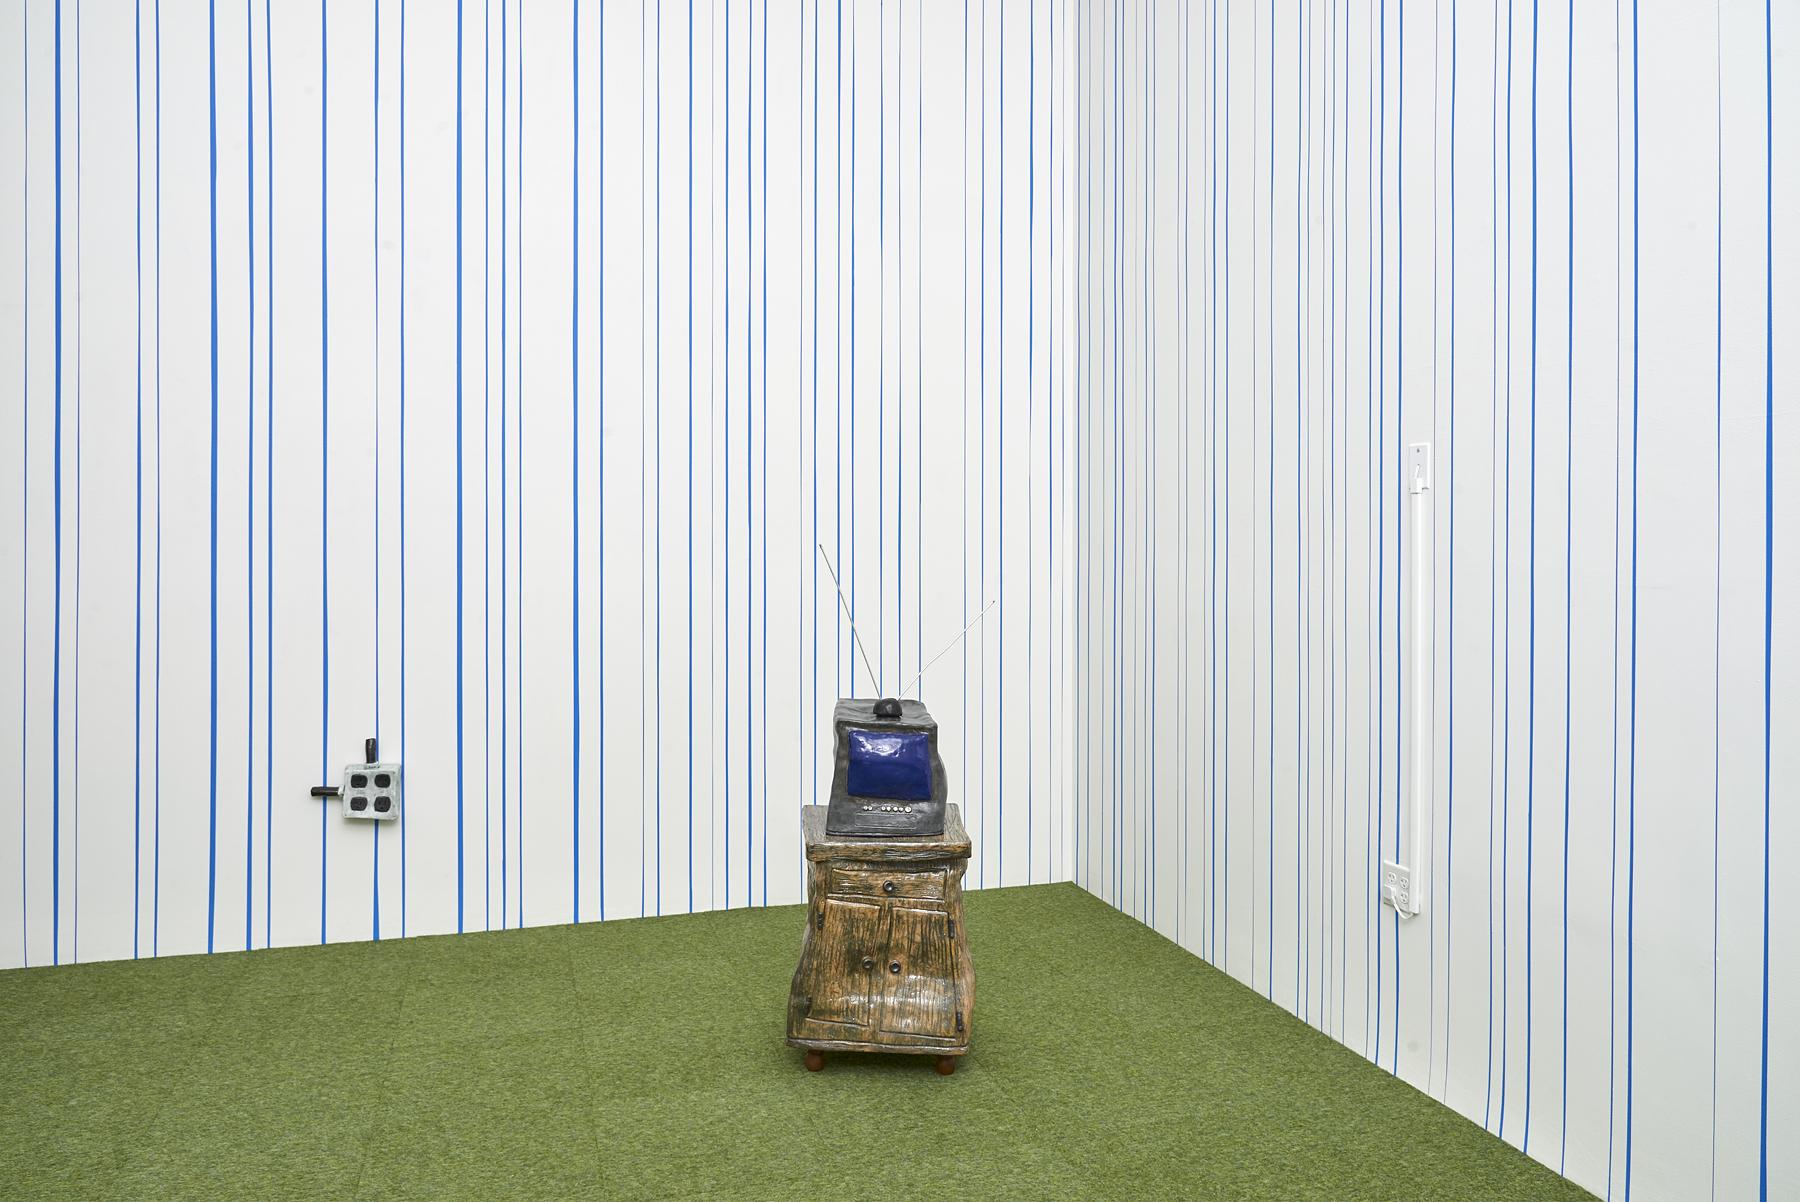 Othello_Living Room, 2018_Jessica Silverman Gallery_Installation view 19.PRS.jpg